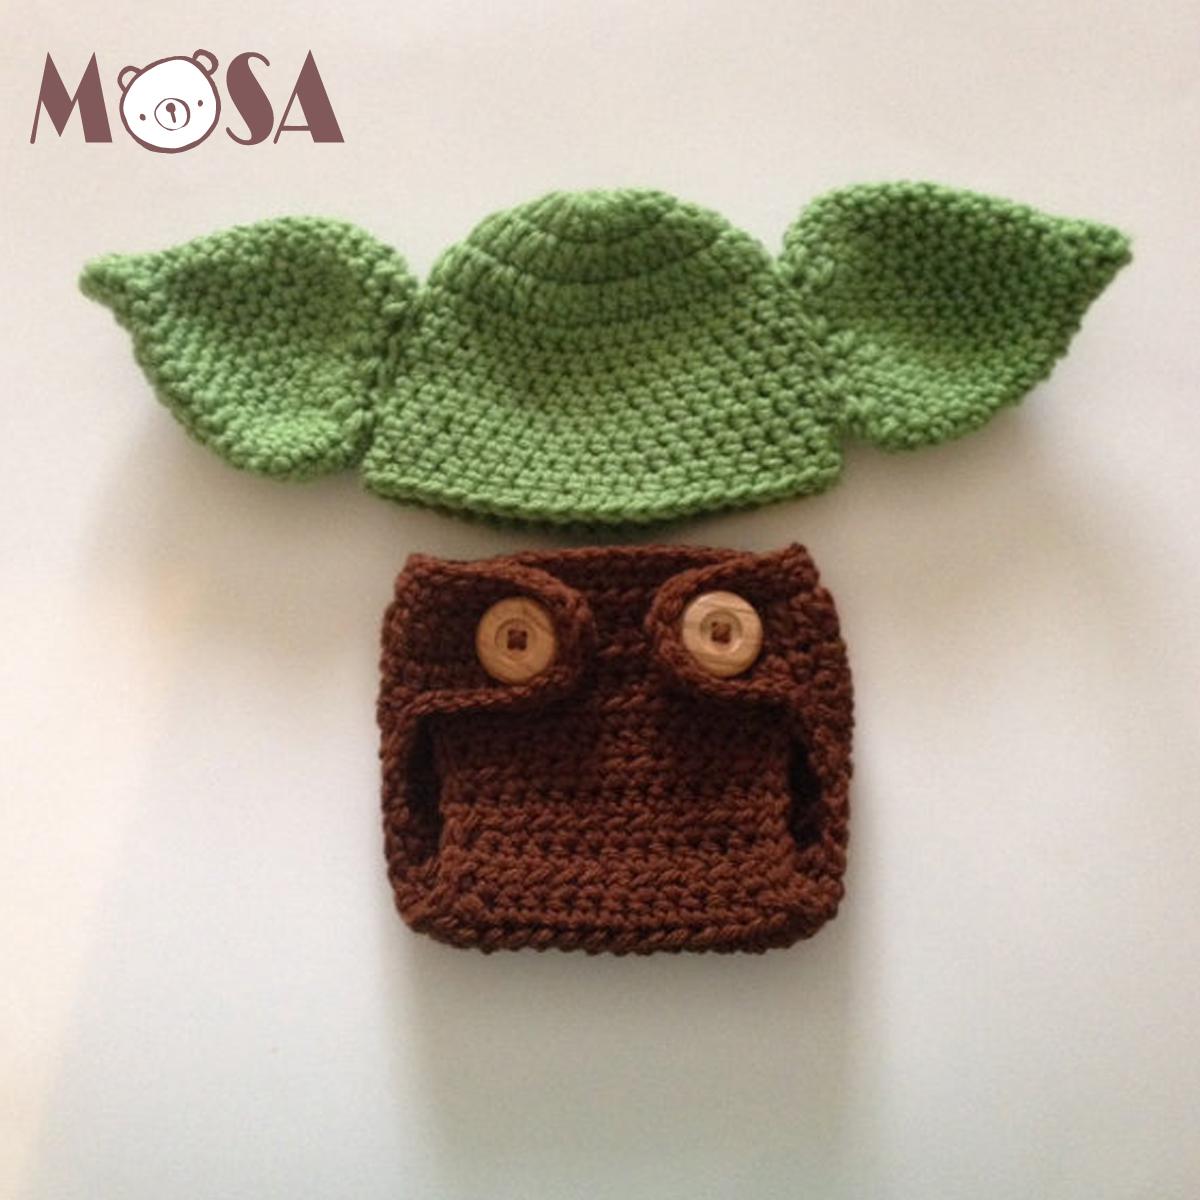 Crochet Newborn Yoda Inspired Baby Green Hat And Matching Brown